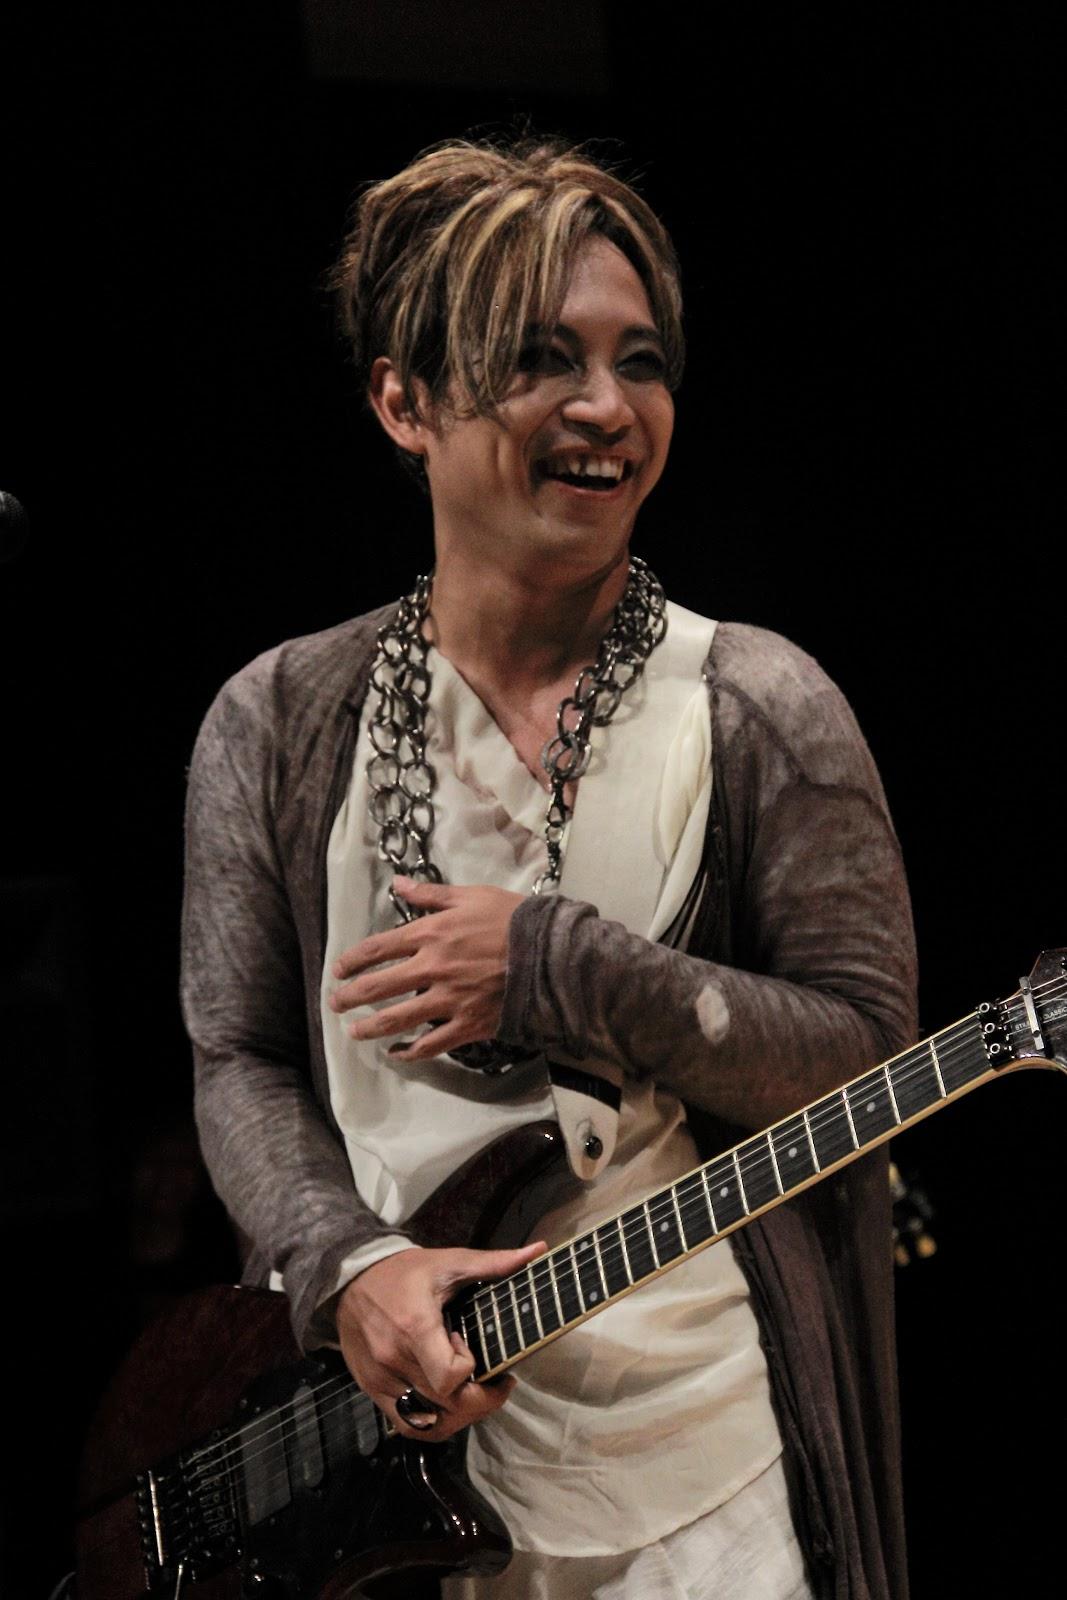 iman j rock concert in japan